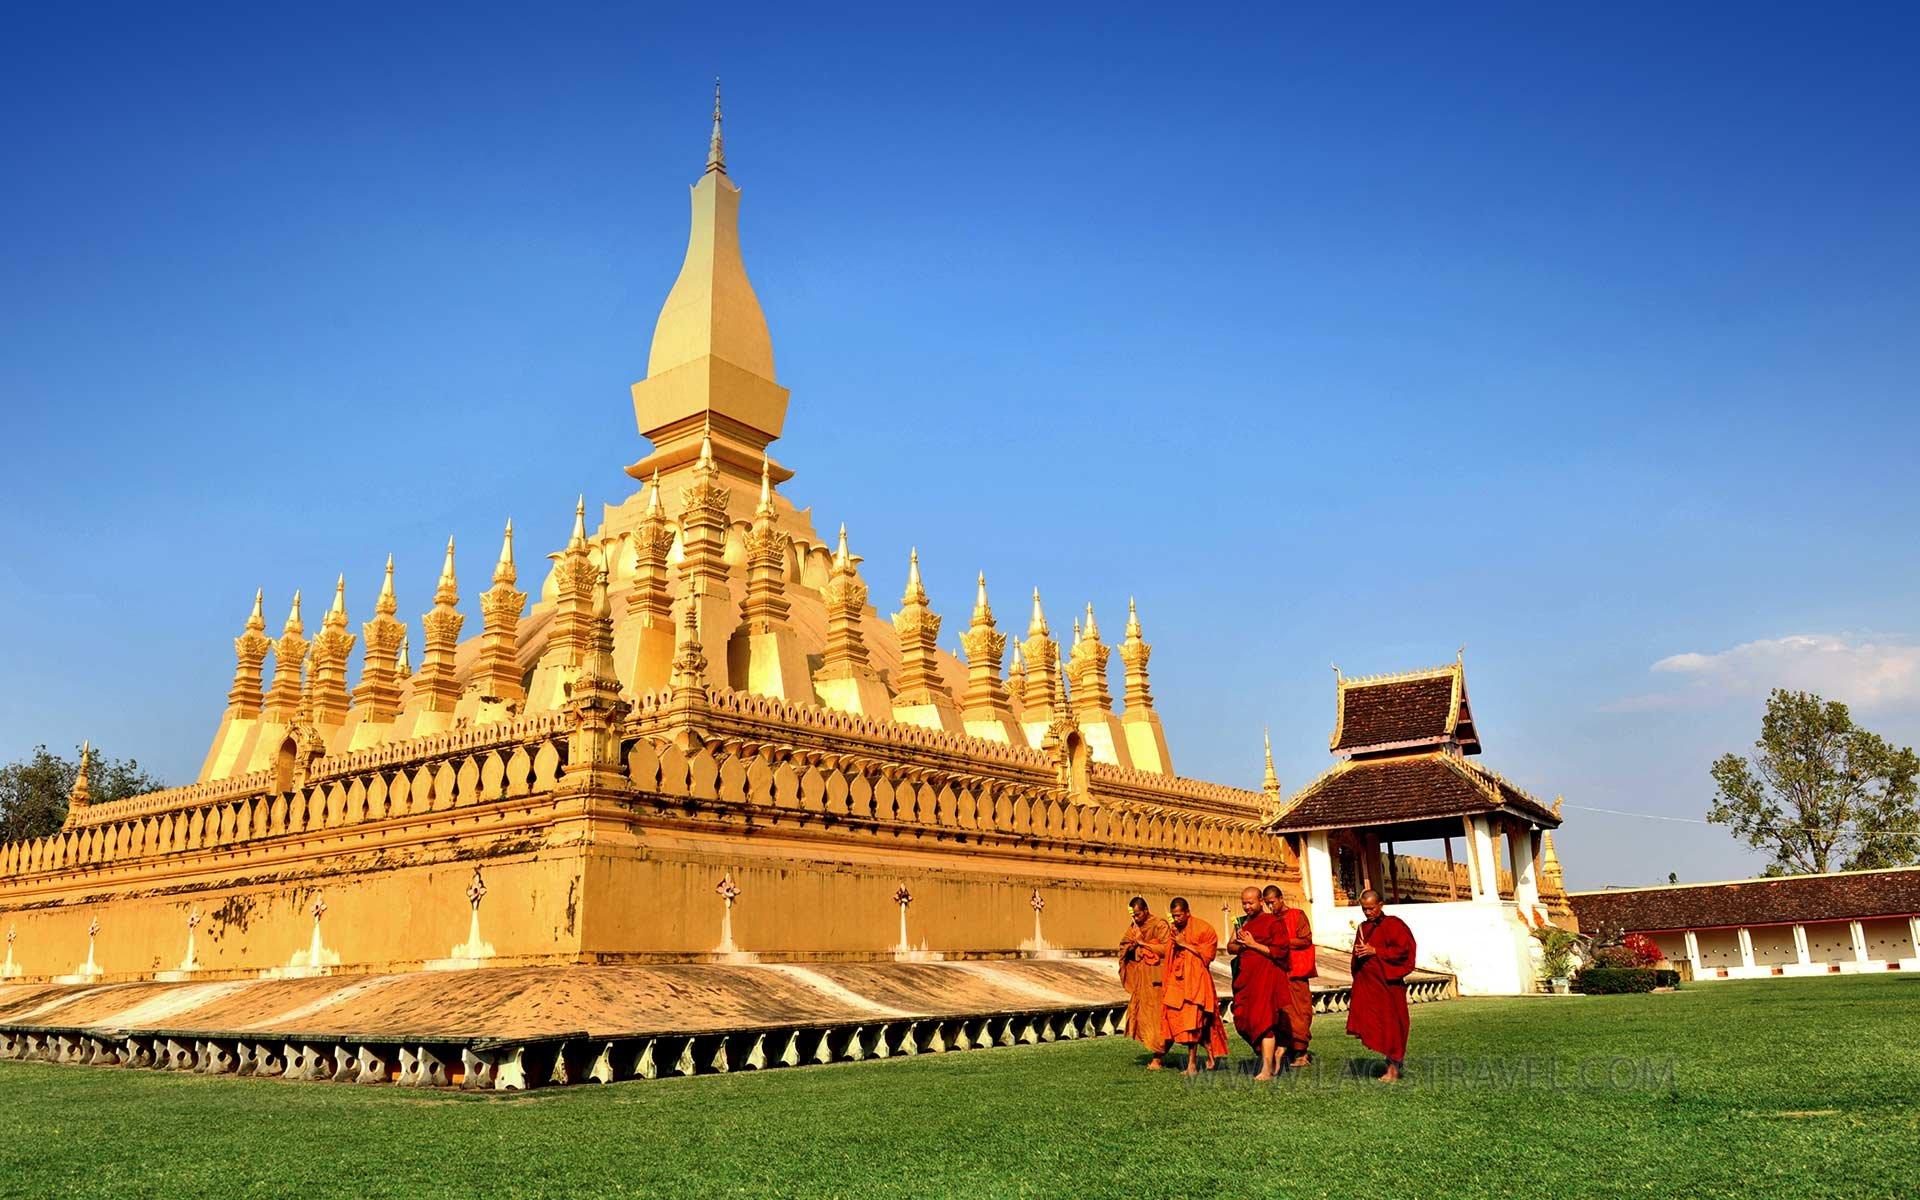 Indochina Tour ( Vietnam, Laos, Cambodia) - 15 Days